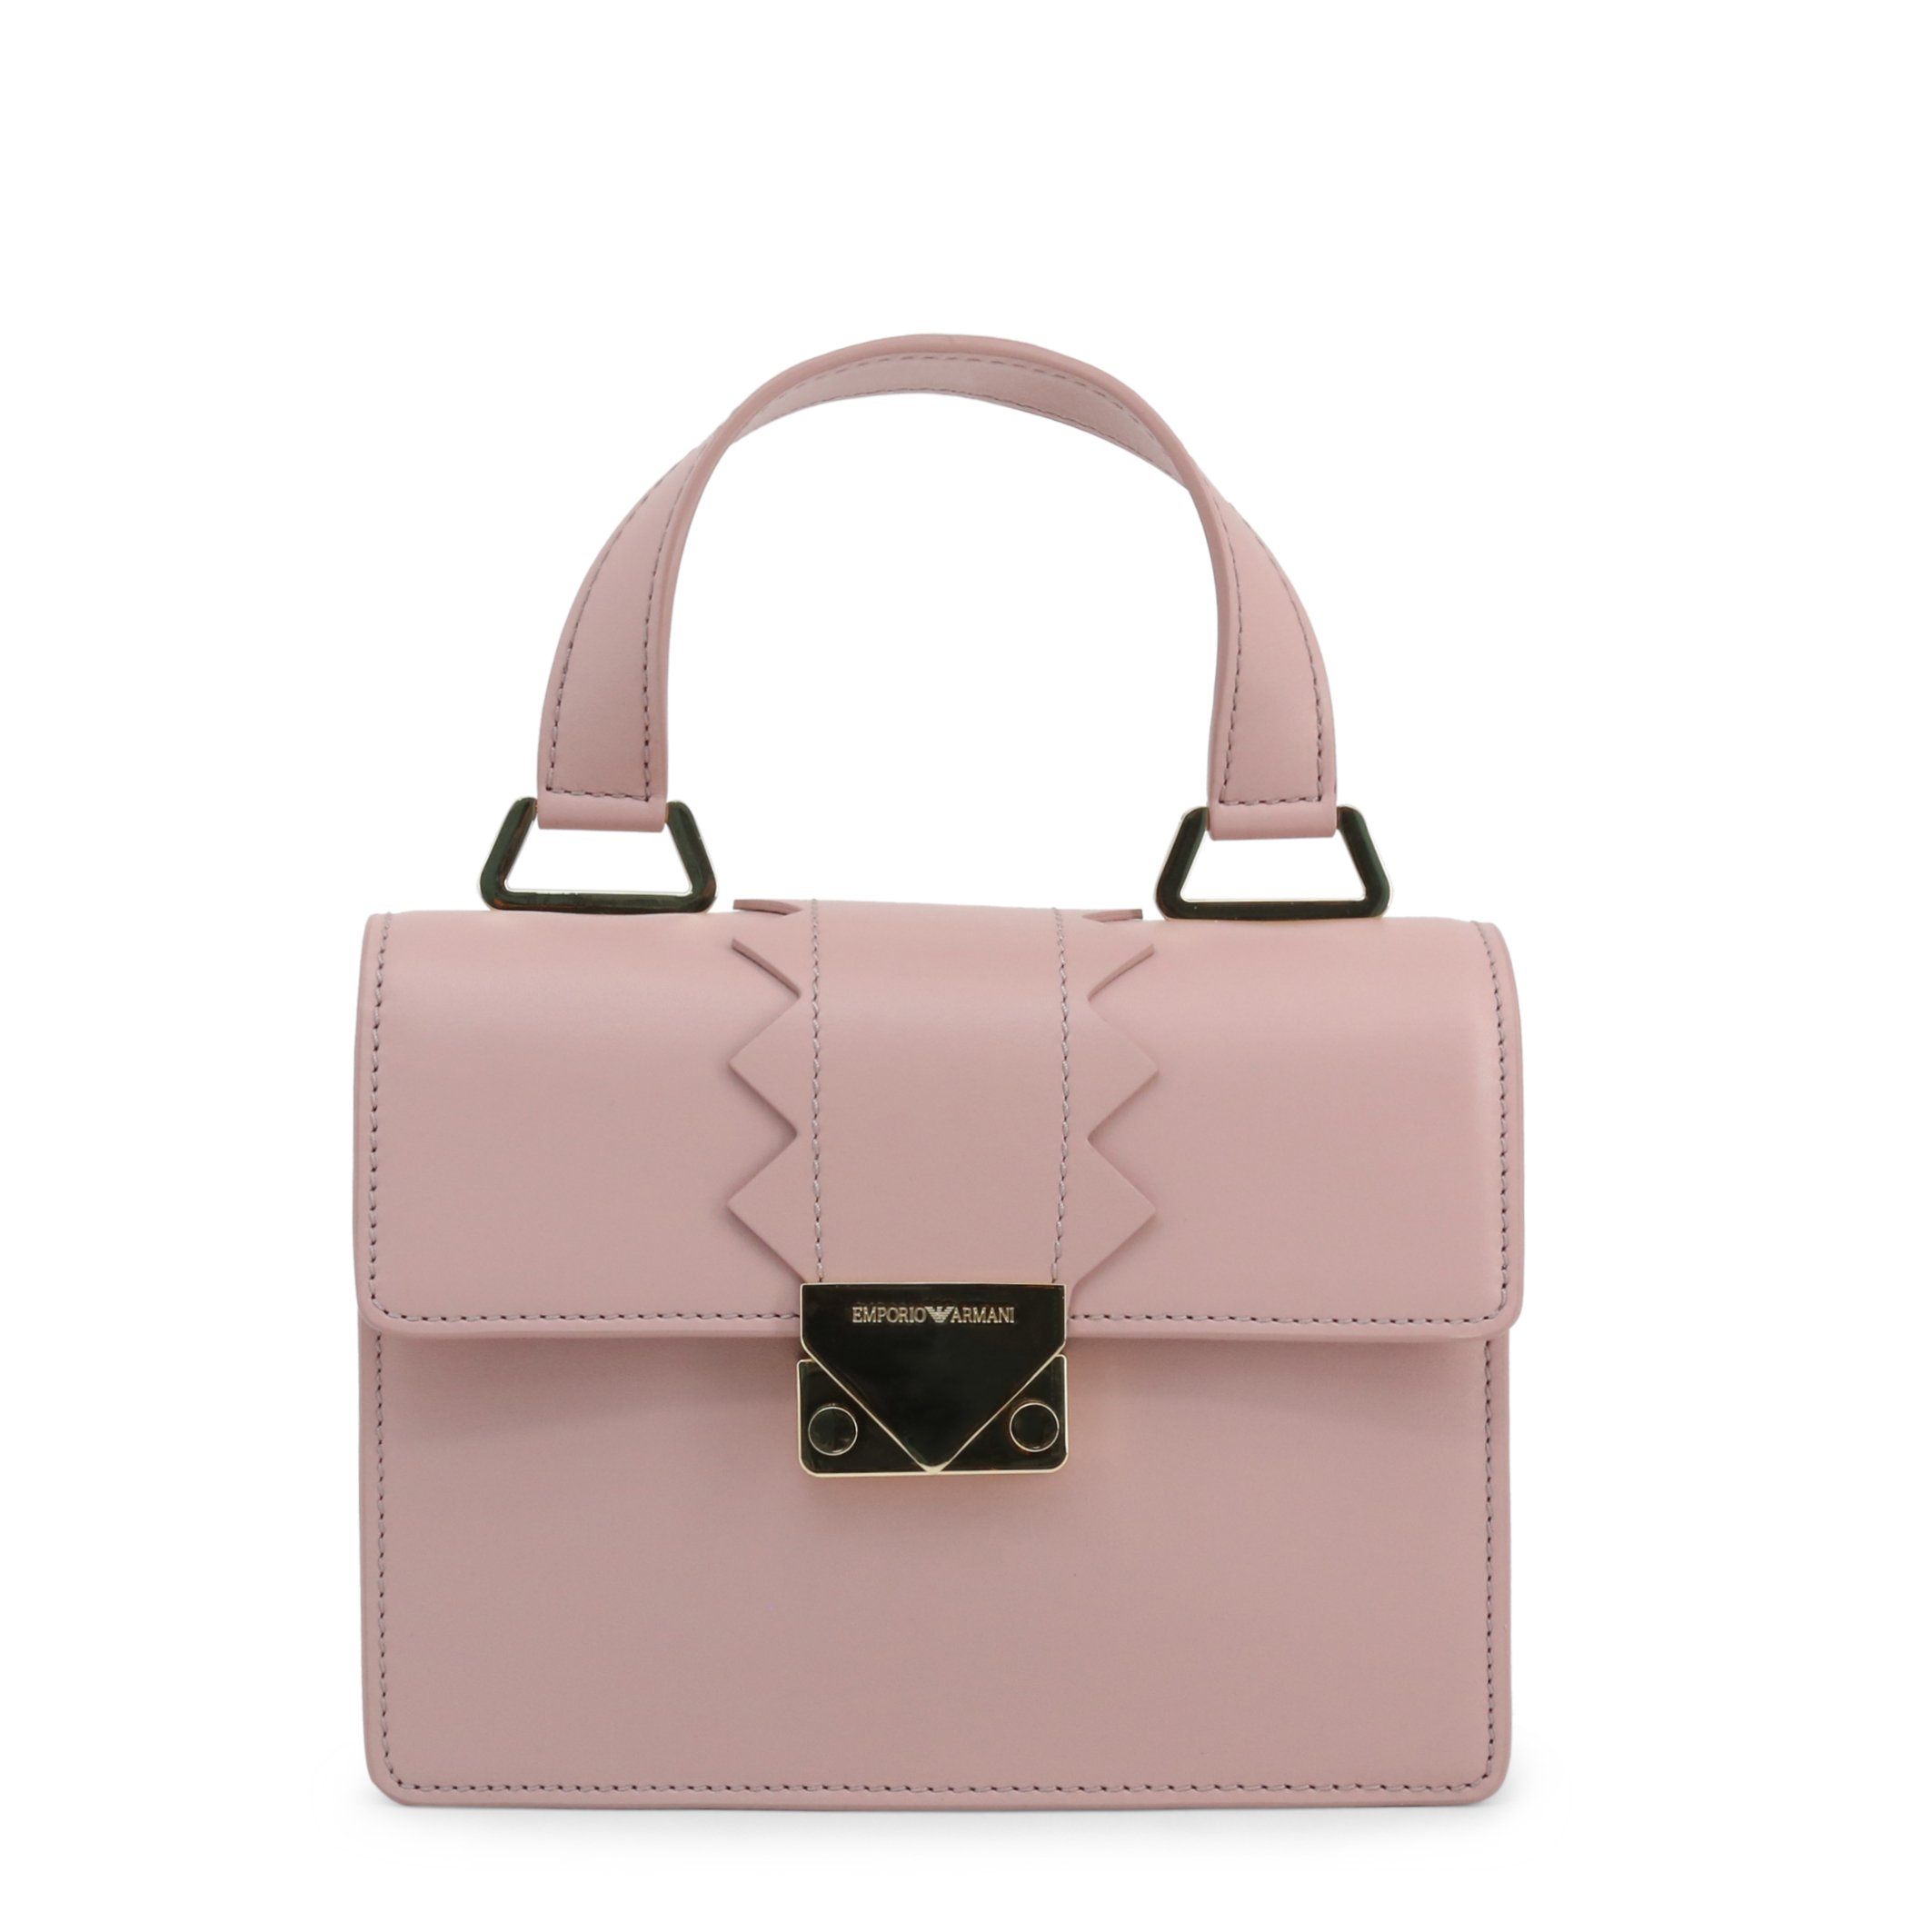 Emporio Armani Women's Handbag Various Colours Y3B075 YDC1A - pink NOSIZE